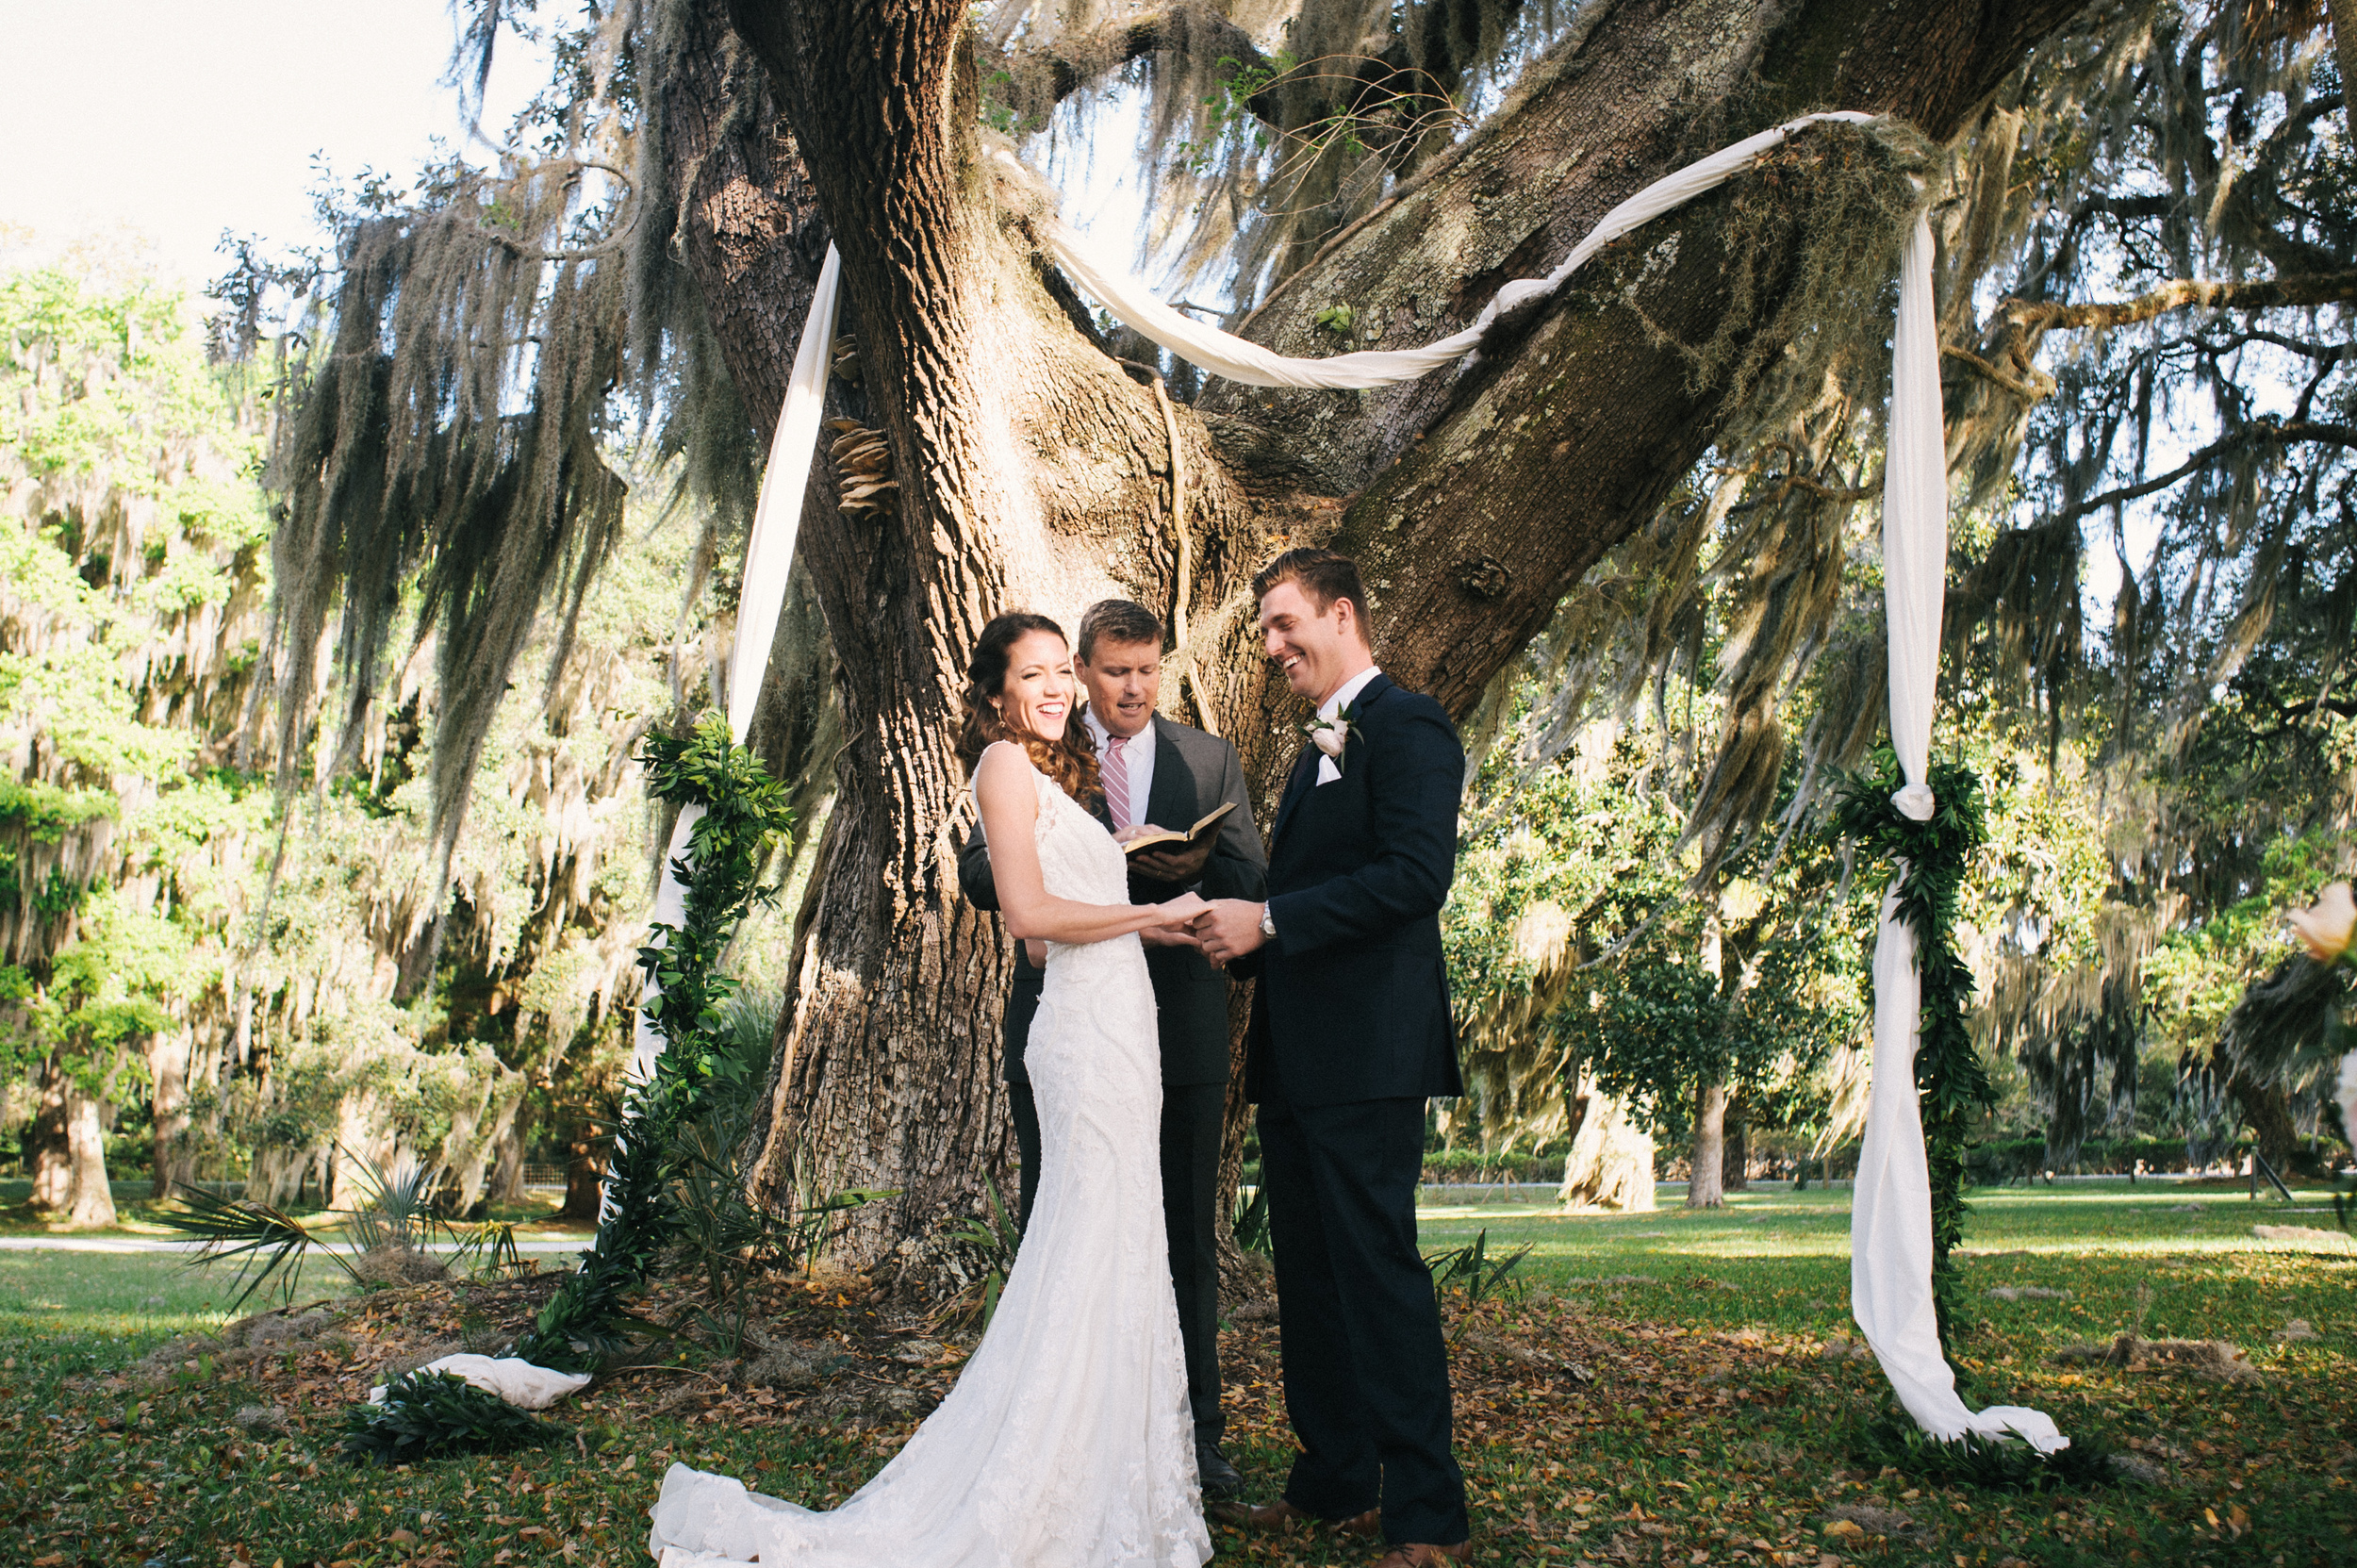 kadi-and-matt-carroll-april-9-2016-jekyl-island-wedding-m-newsom-photography- (469 of 744).jpg